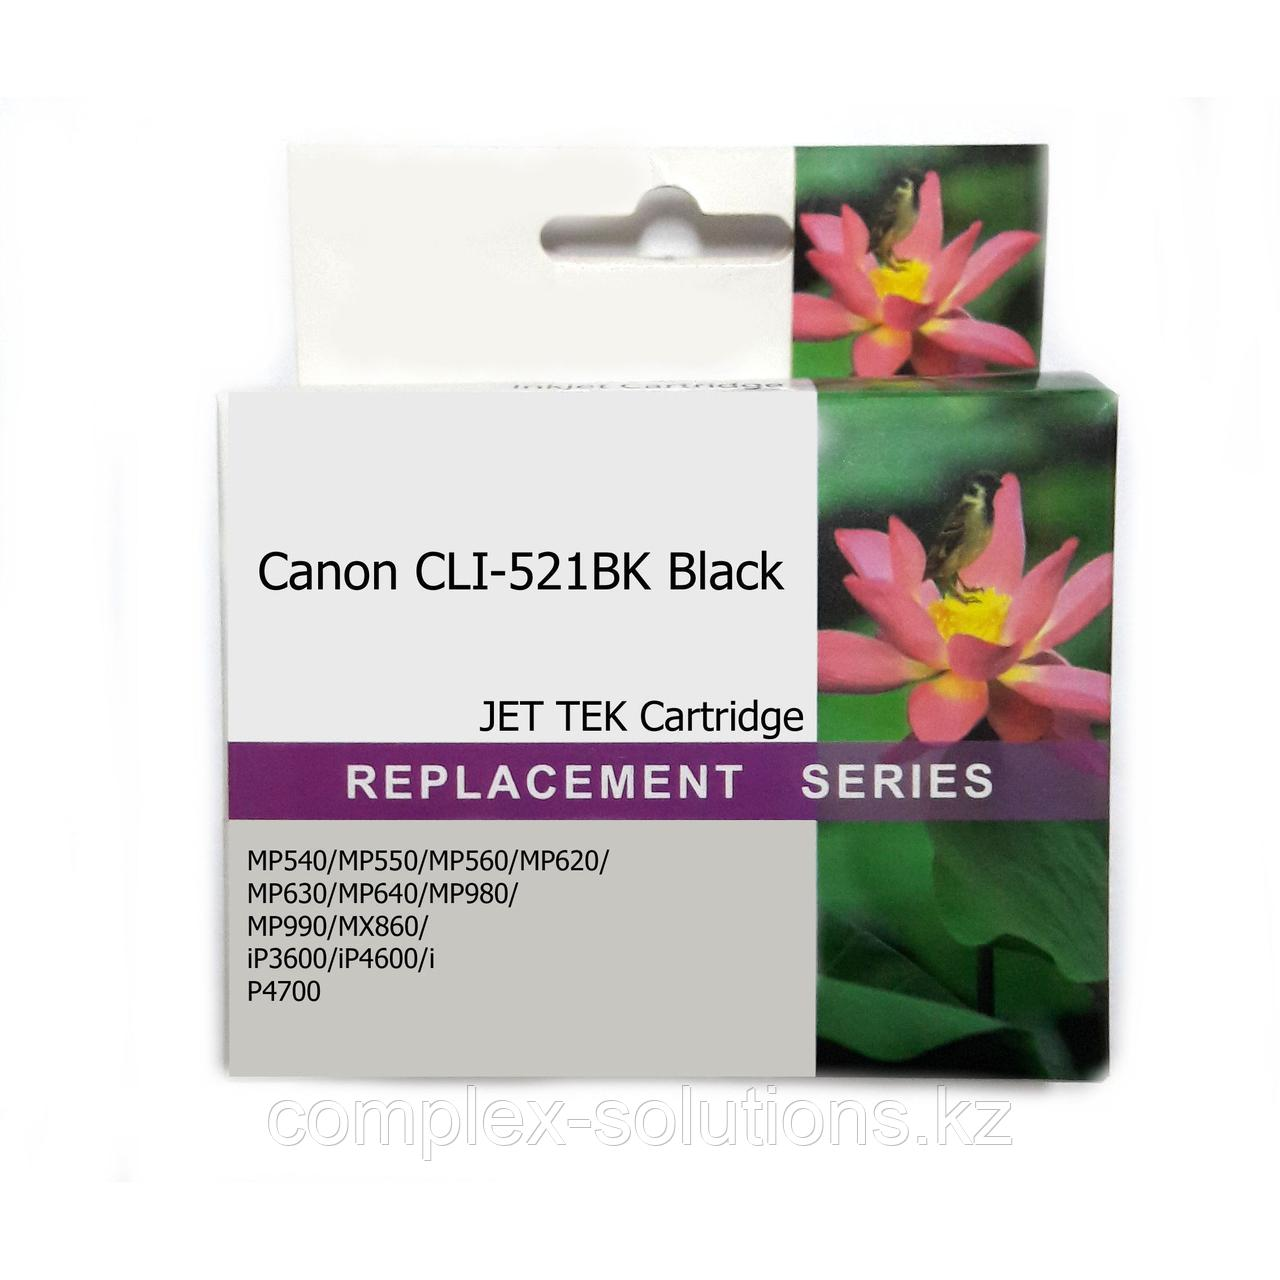 Картридж CANON CLI-521BK Black JET TEK | [качественный дубликат]